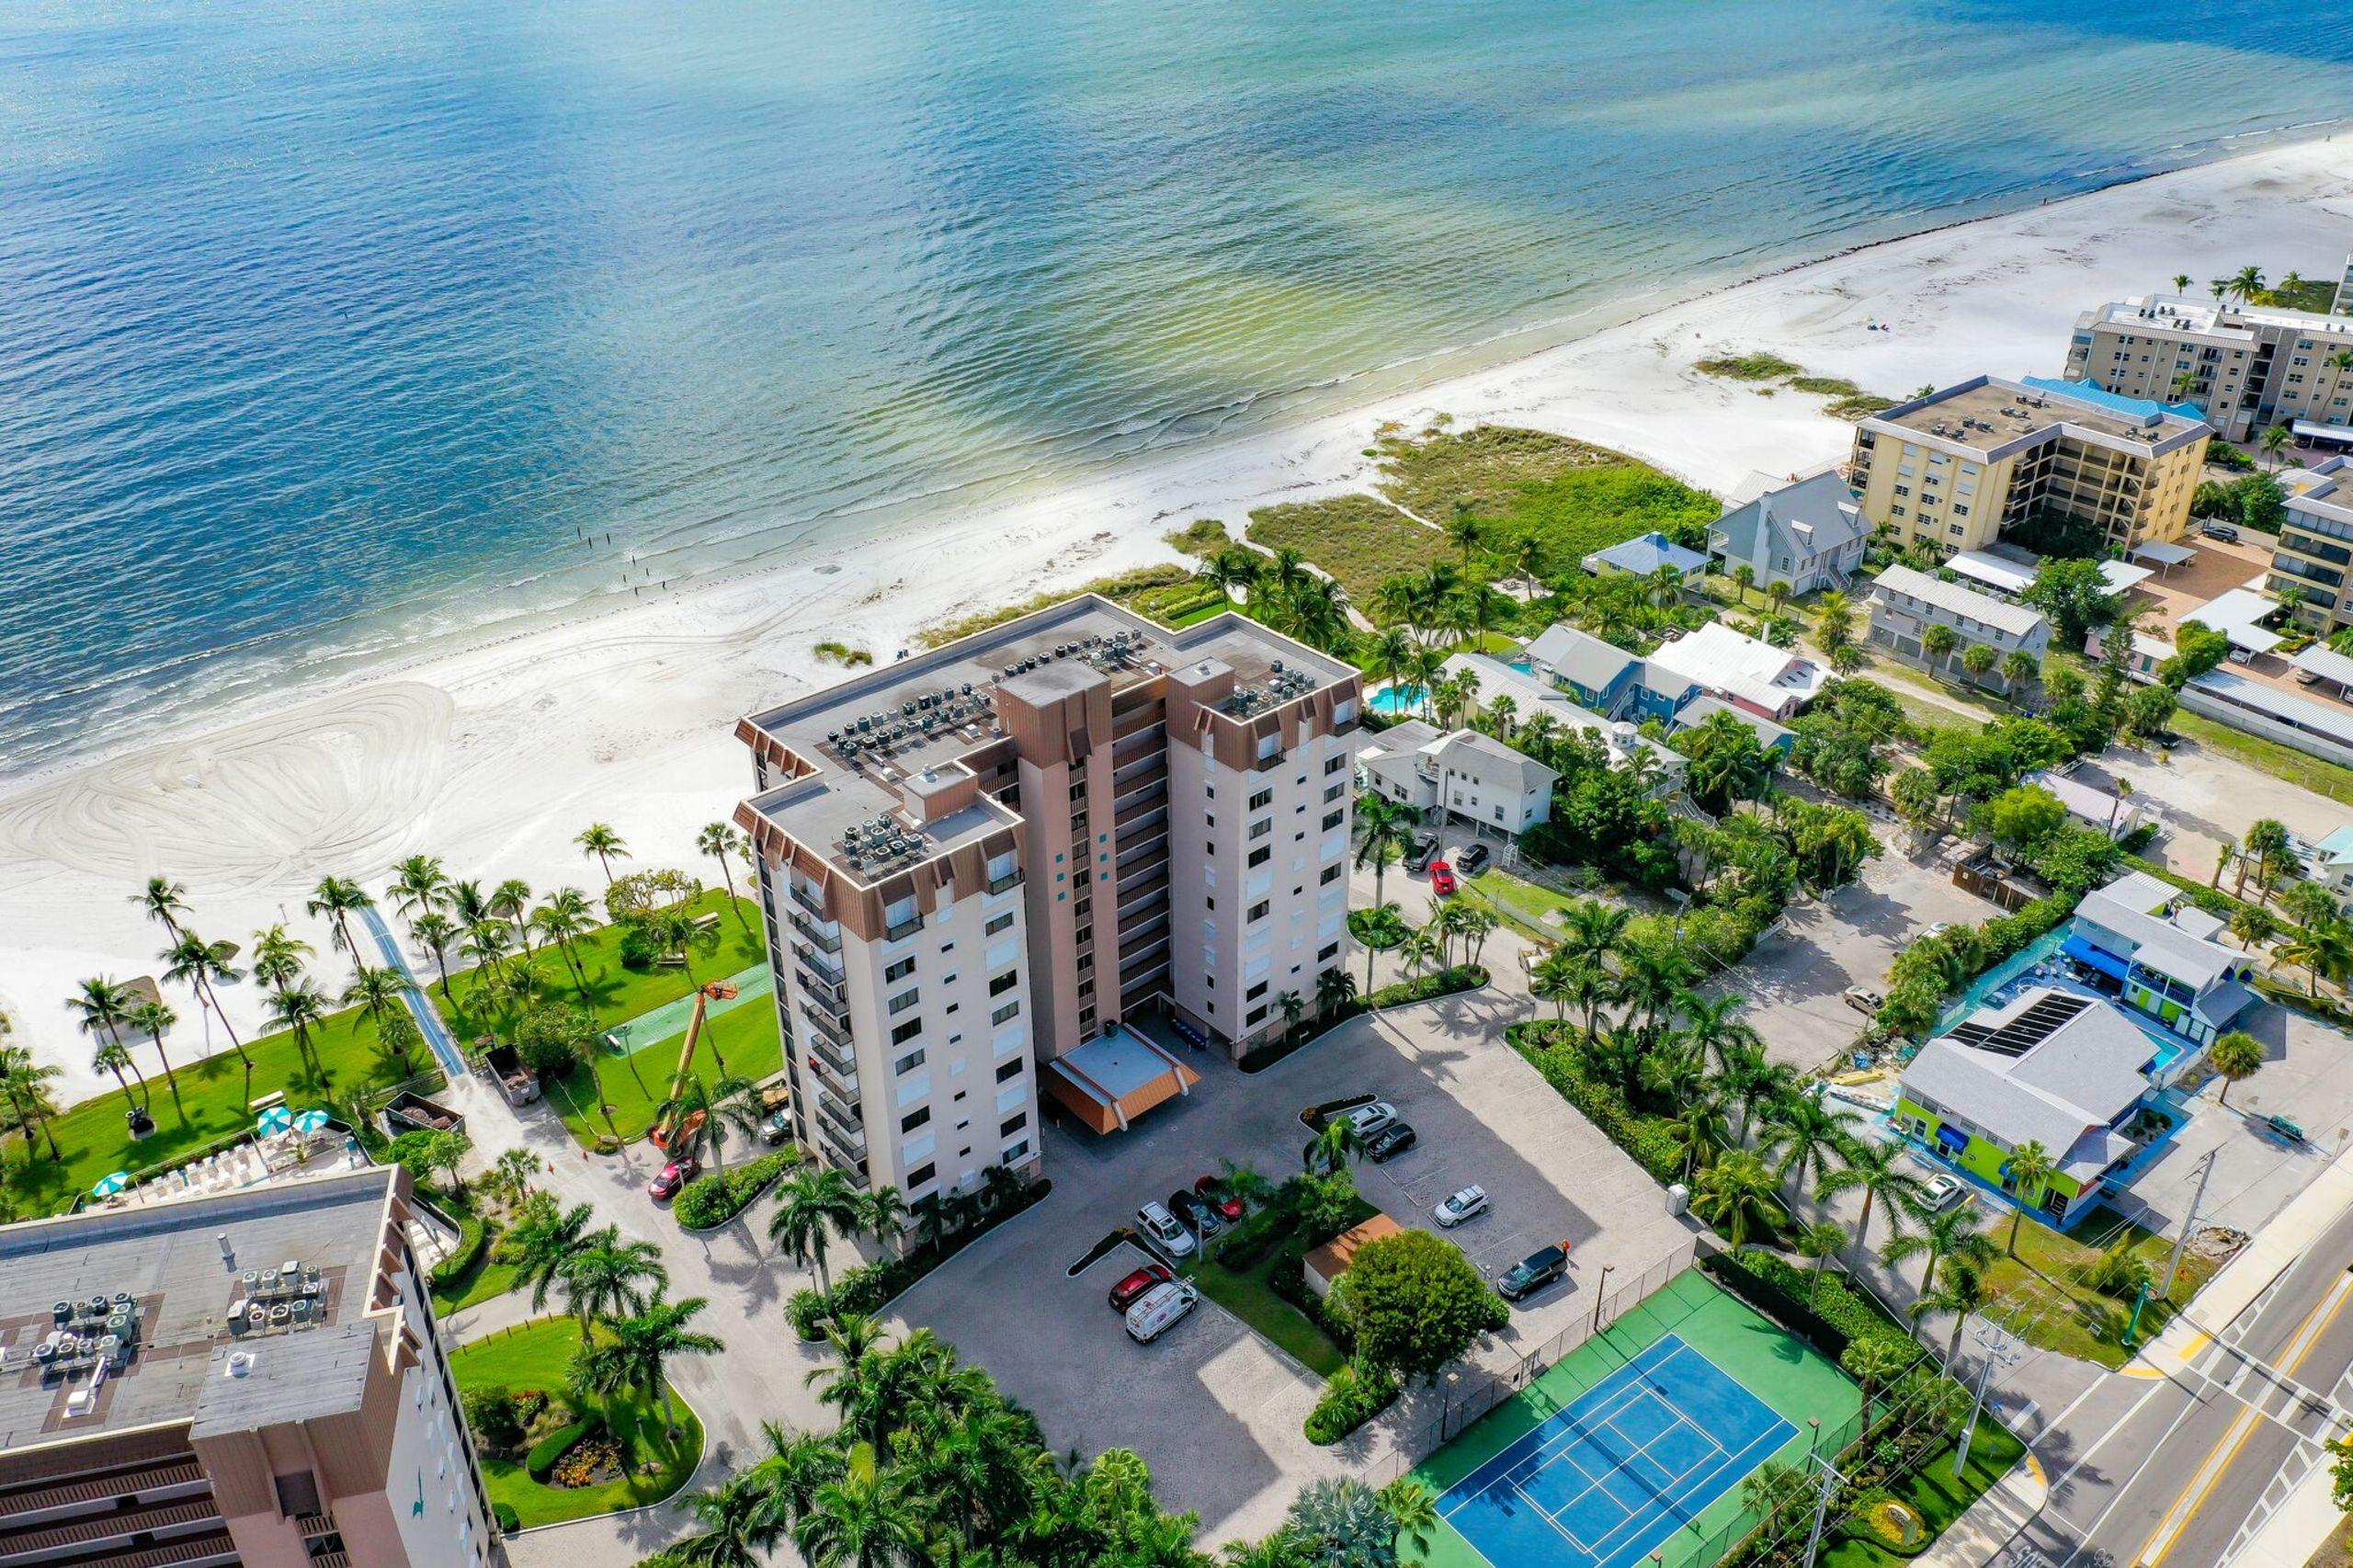 Upscale Caper Beach Club Condos from $749,900